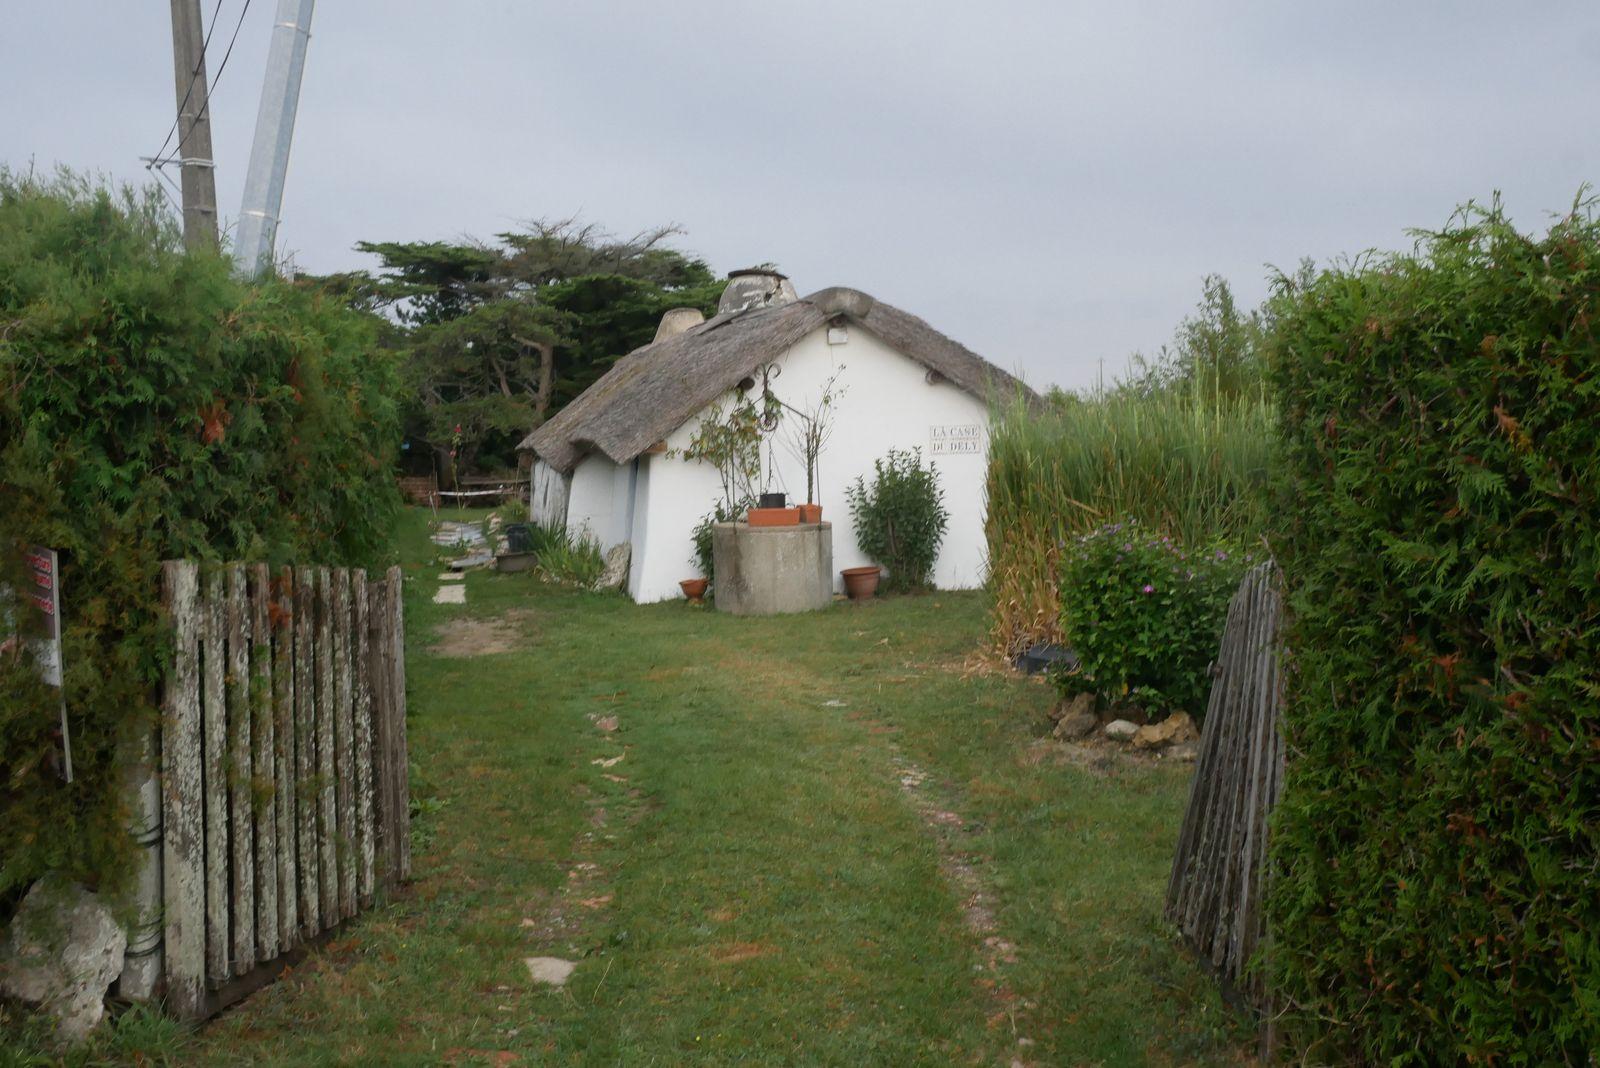 La bourrine, c'est l'habitat typique du pays maraichin